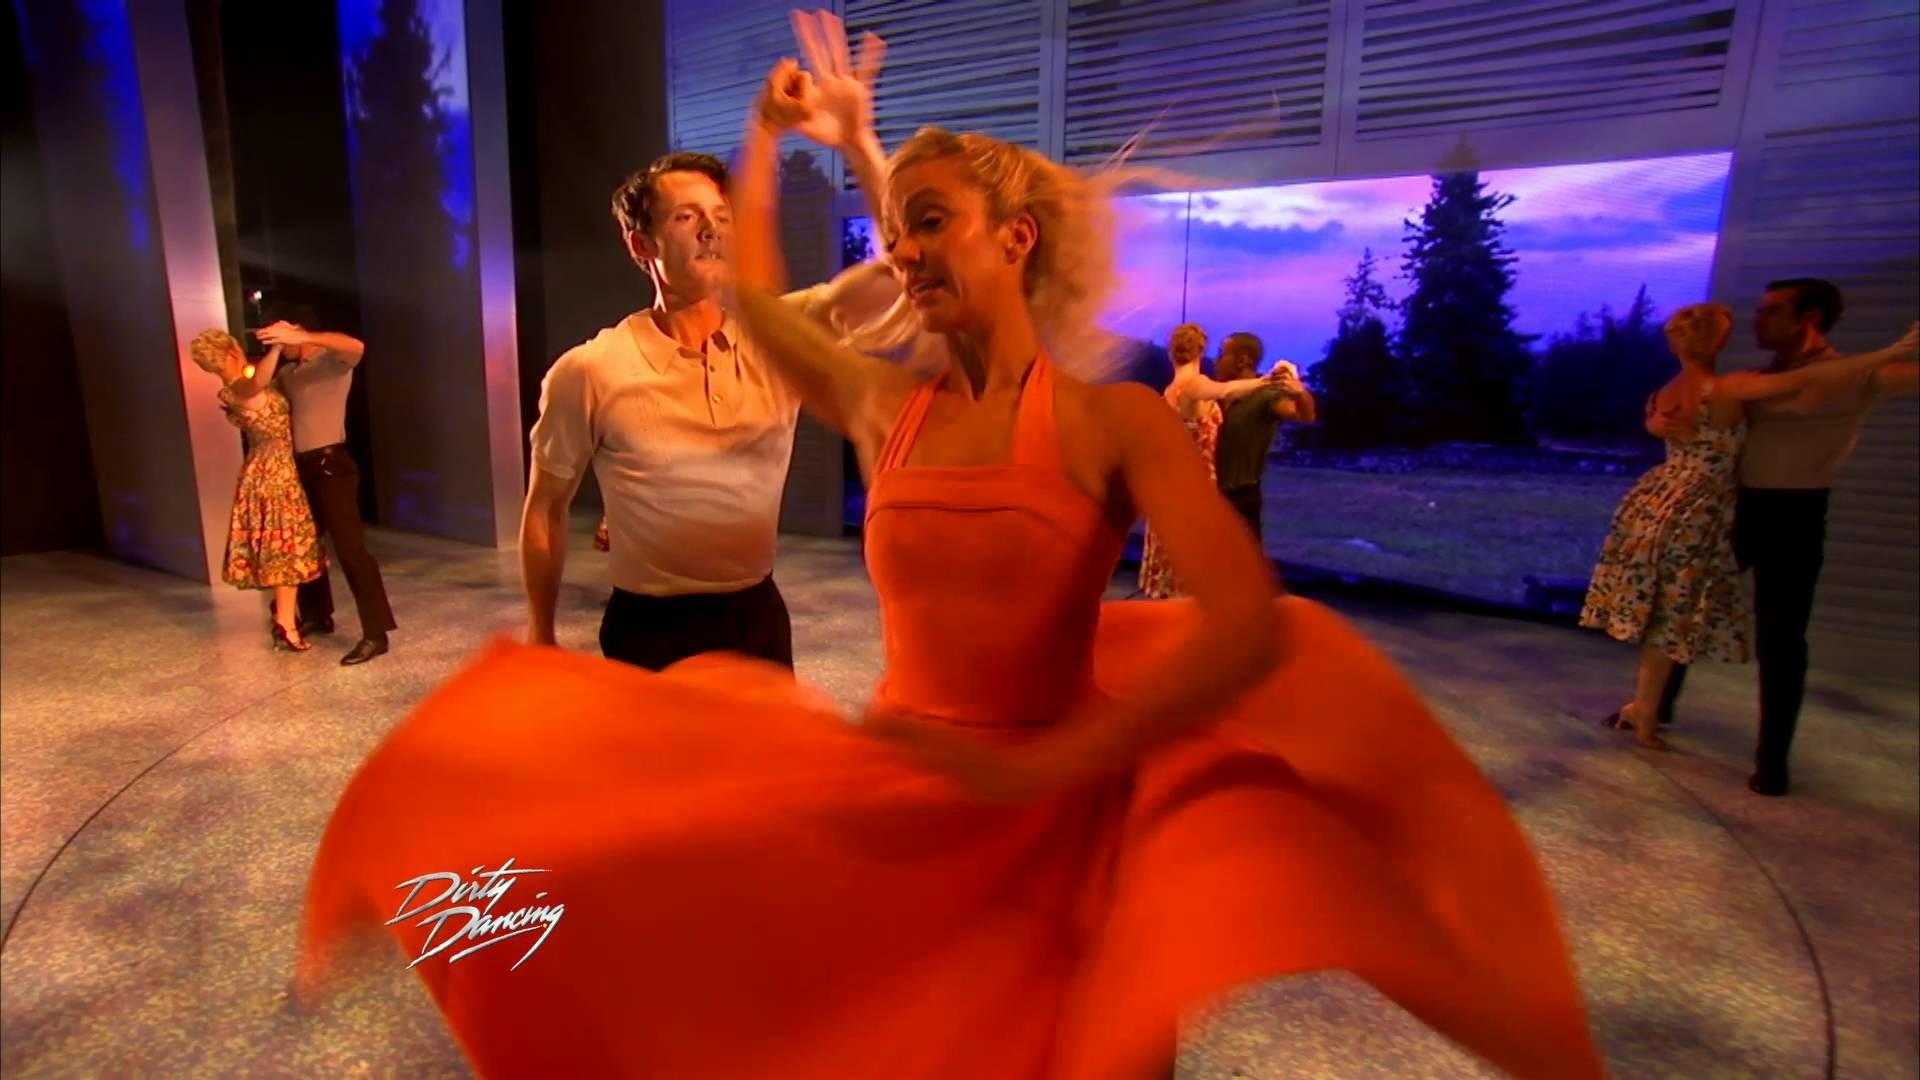 Res: 1920x1080, Dirty Dancing at Eccles Theater June 20-25, 2017